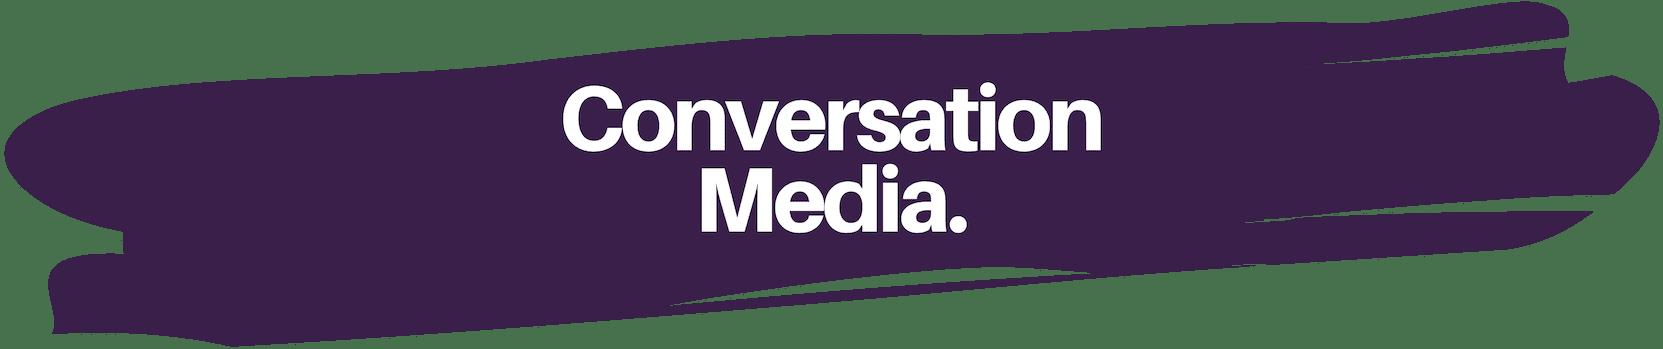 Conversation Media